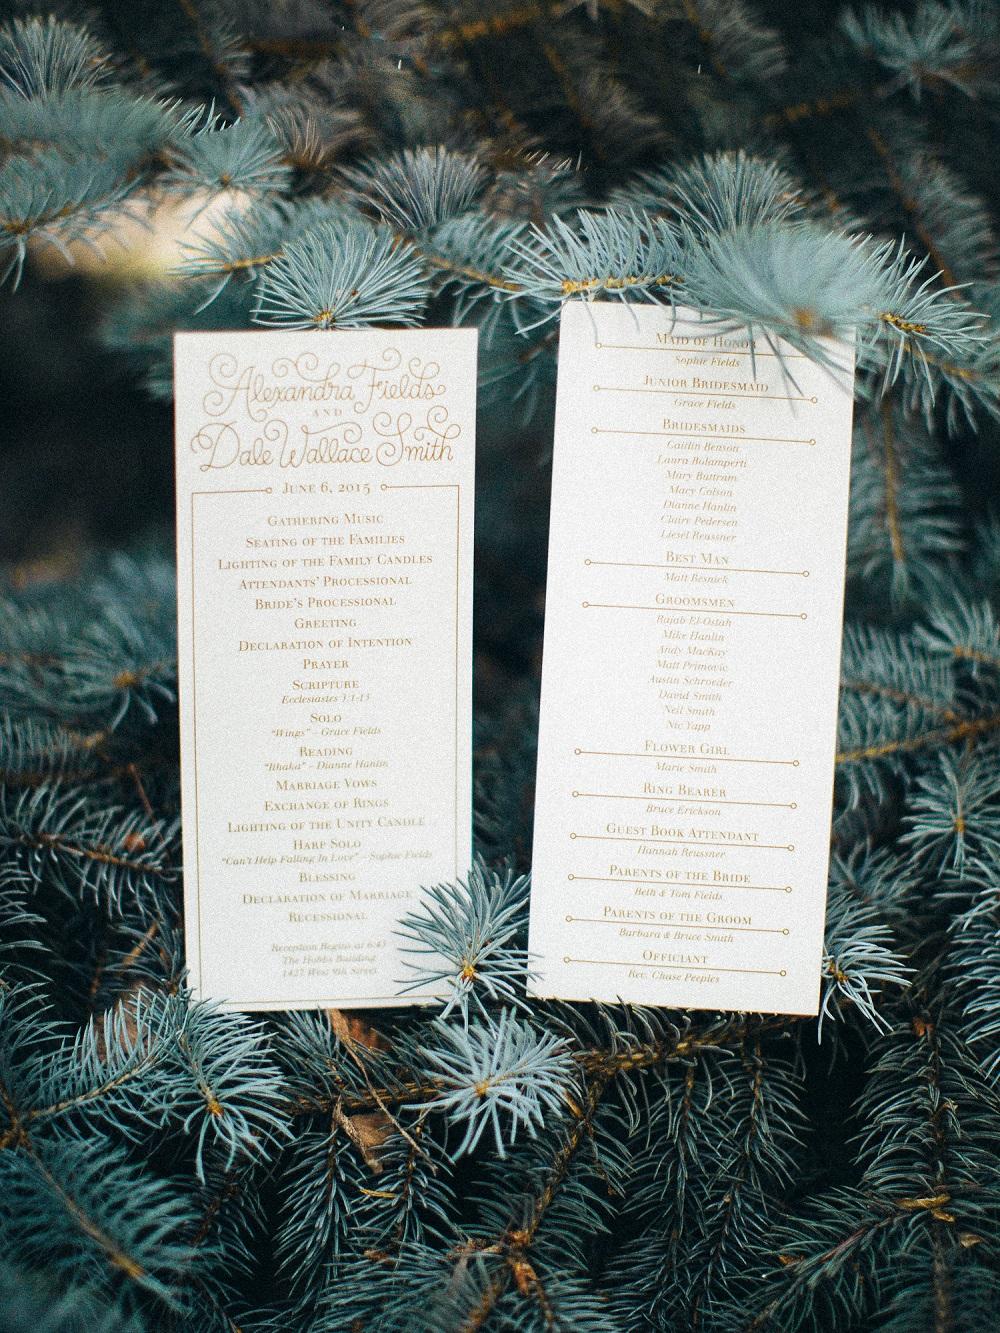 Country Club Congregational Wedding Programs